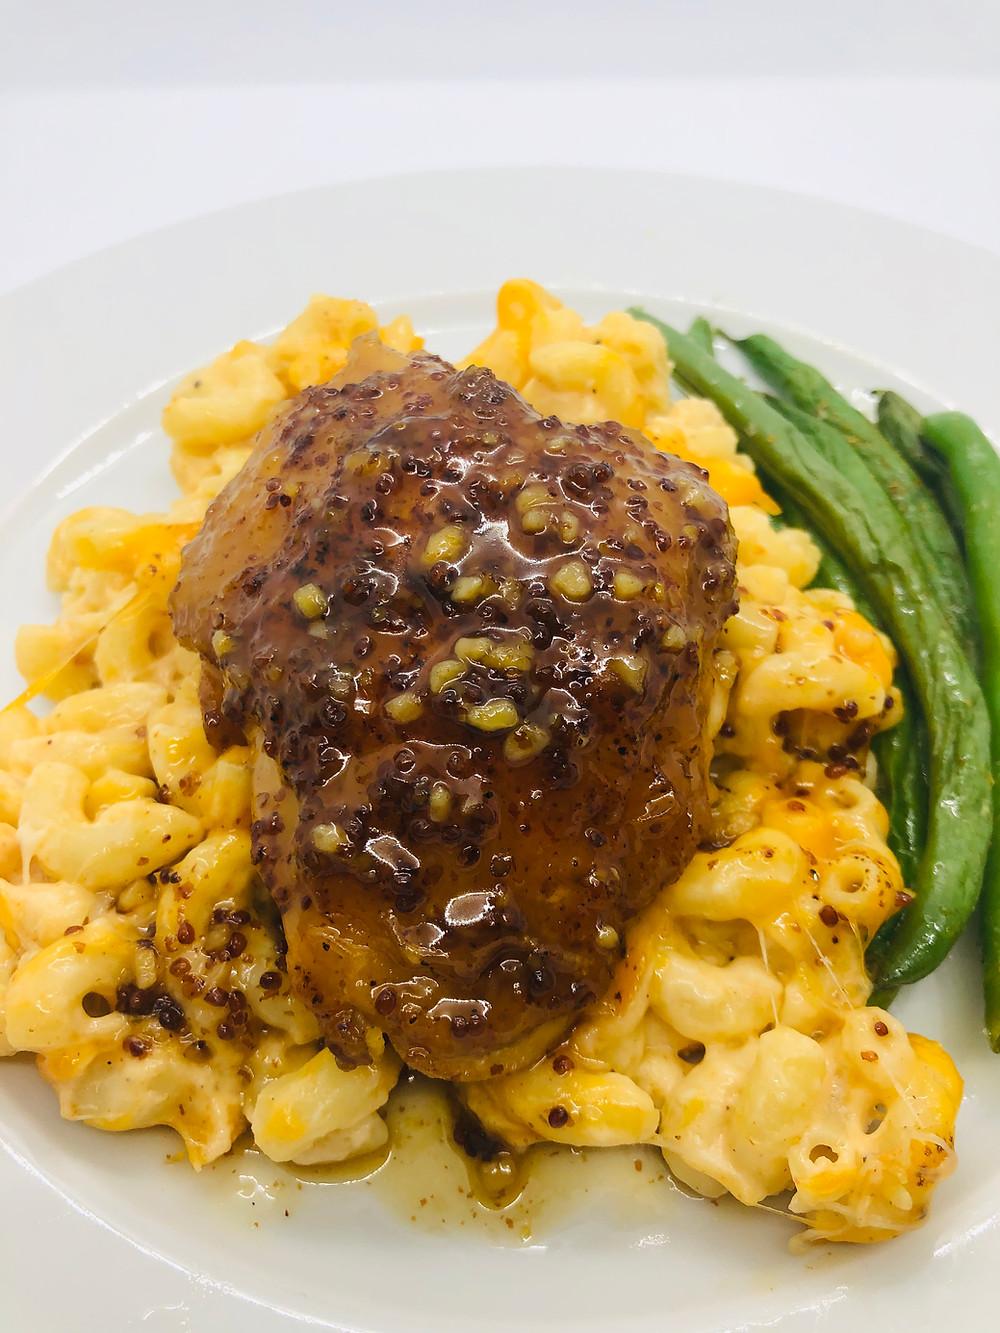 Beautifully caramelized maple-mustard-garlic chicken with broccoli cauli rice